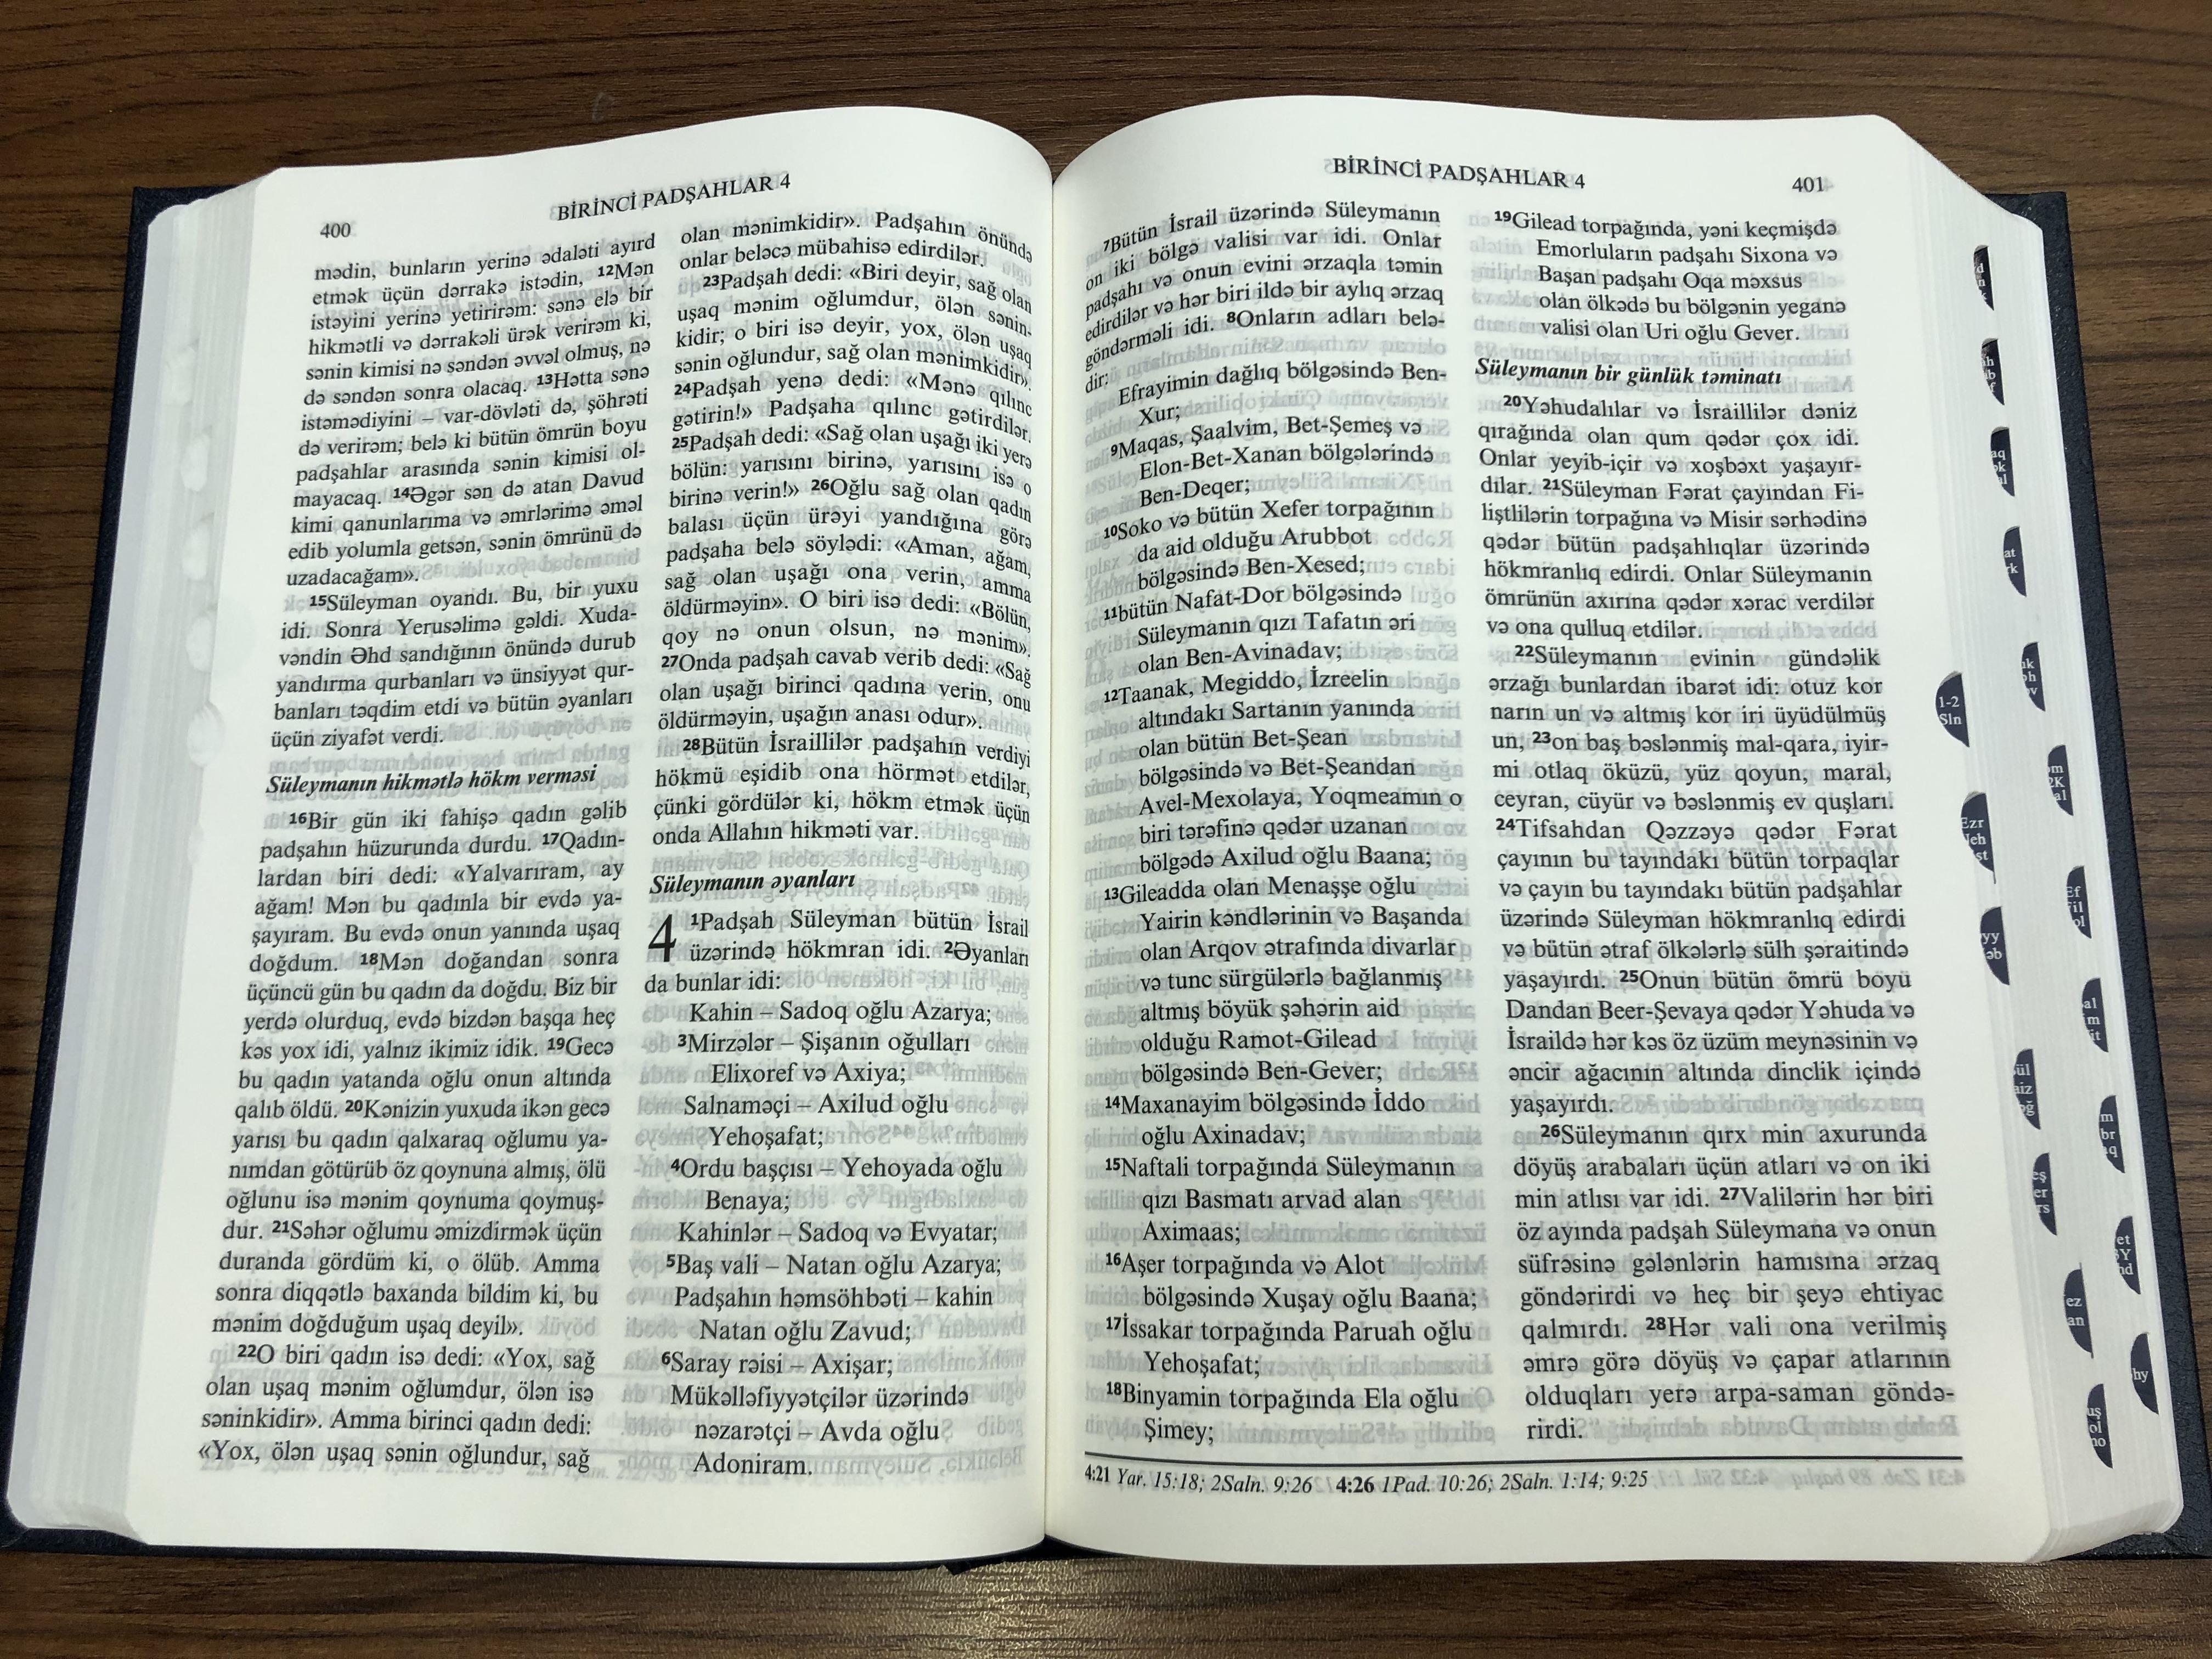 bibliya-azeri-language-with-thumb-index-and-color-maps-text-azerbaijani-latin-a063ti-9-.jpg